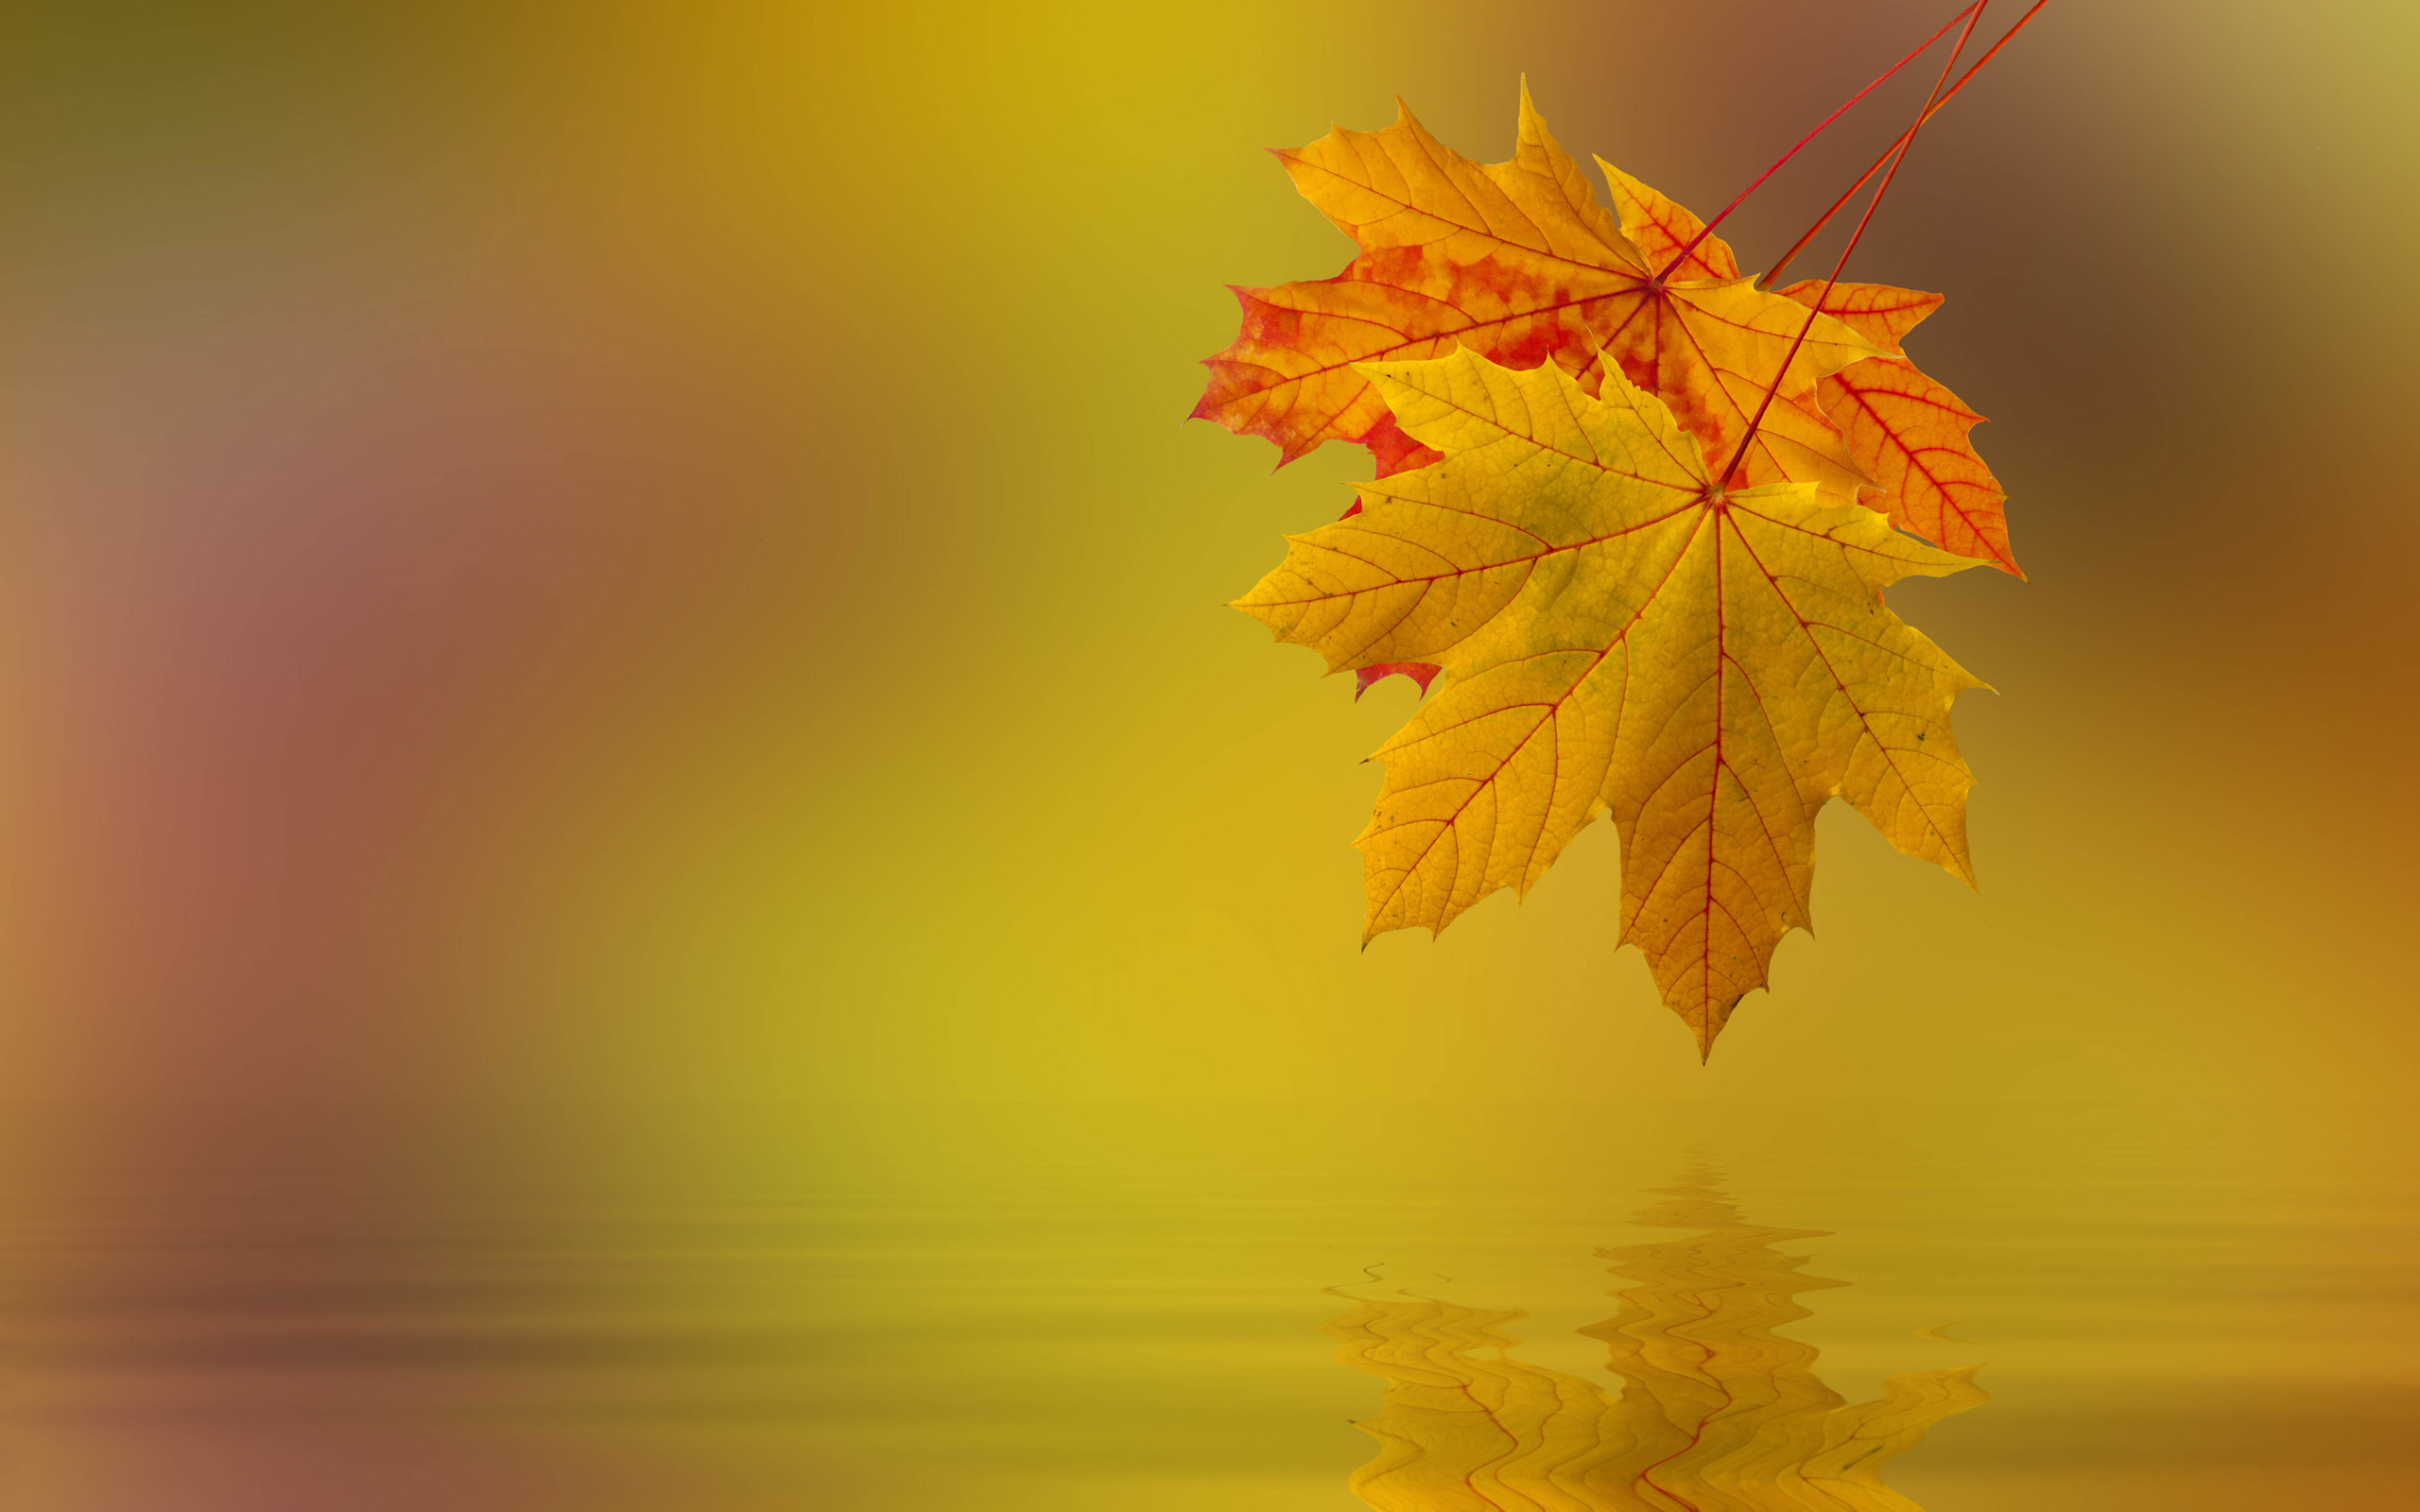 Картинки на презентацию осень, пинтерест